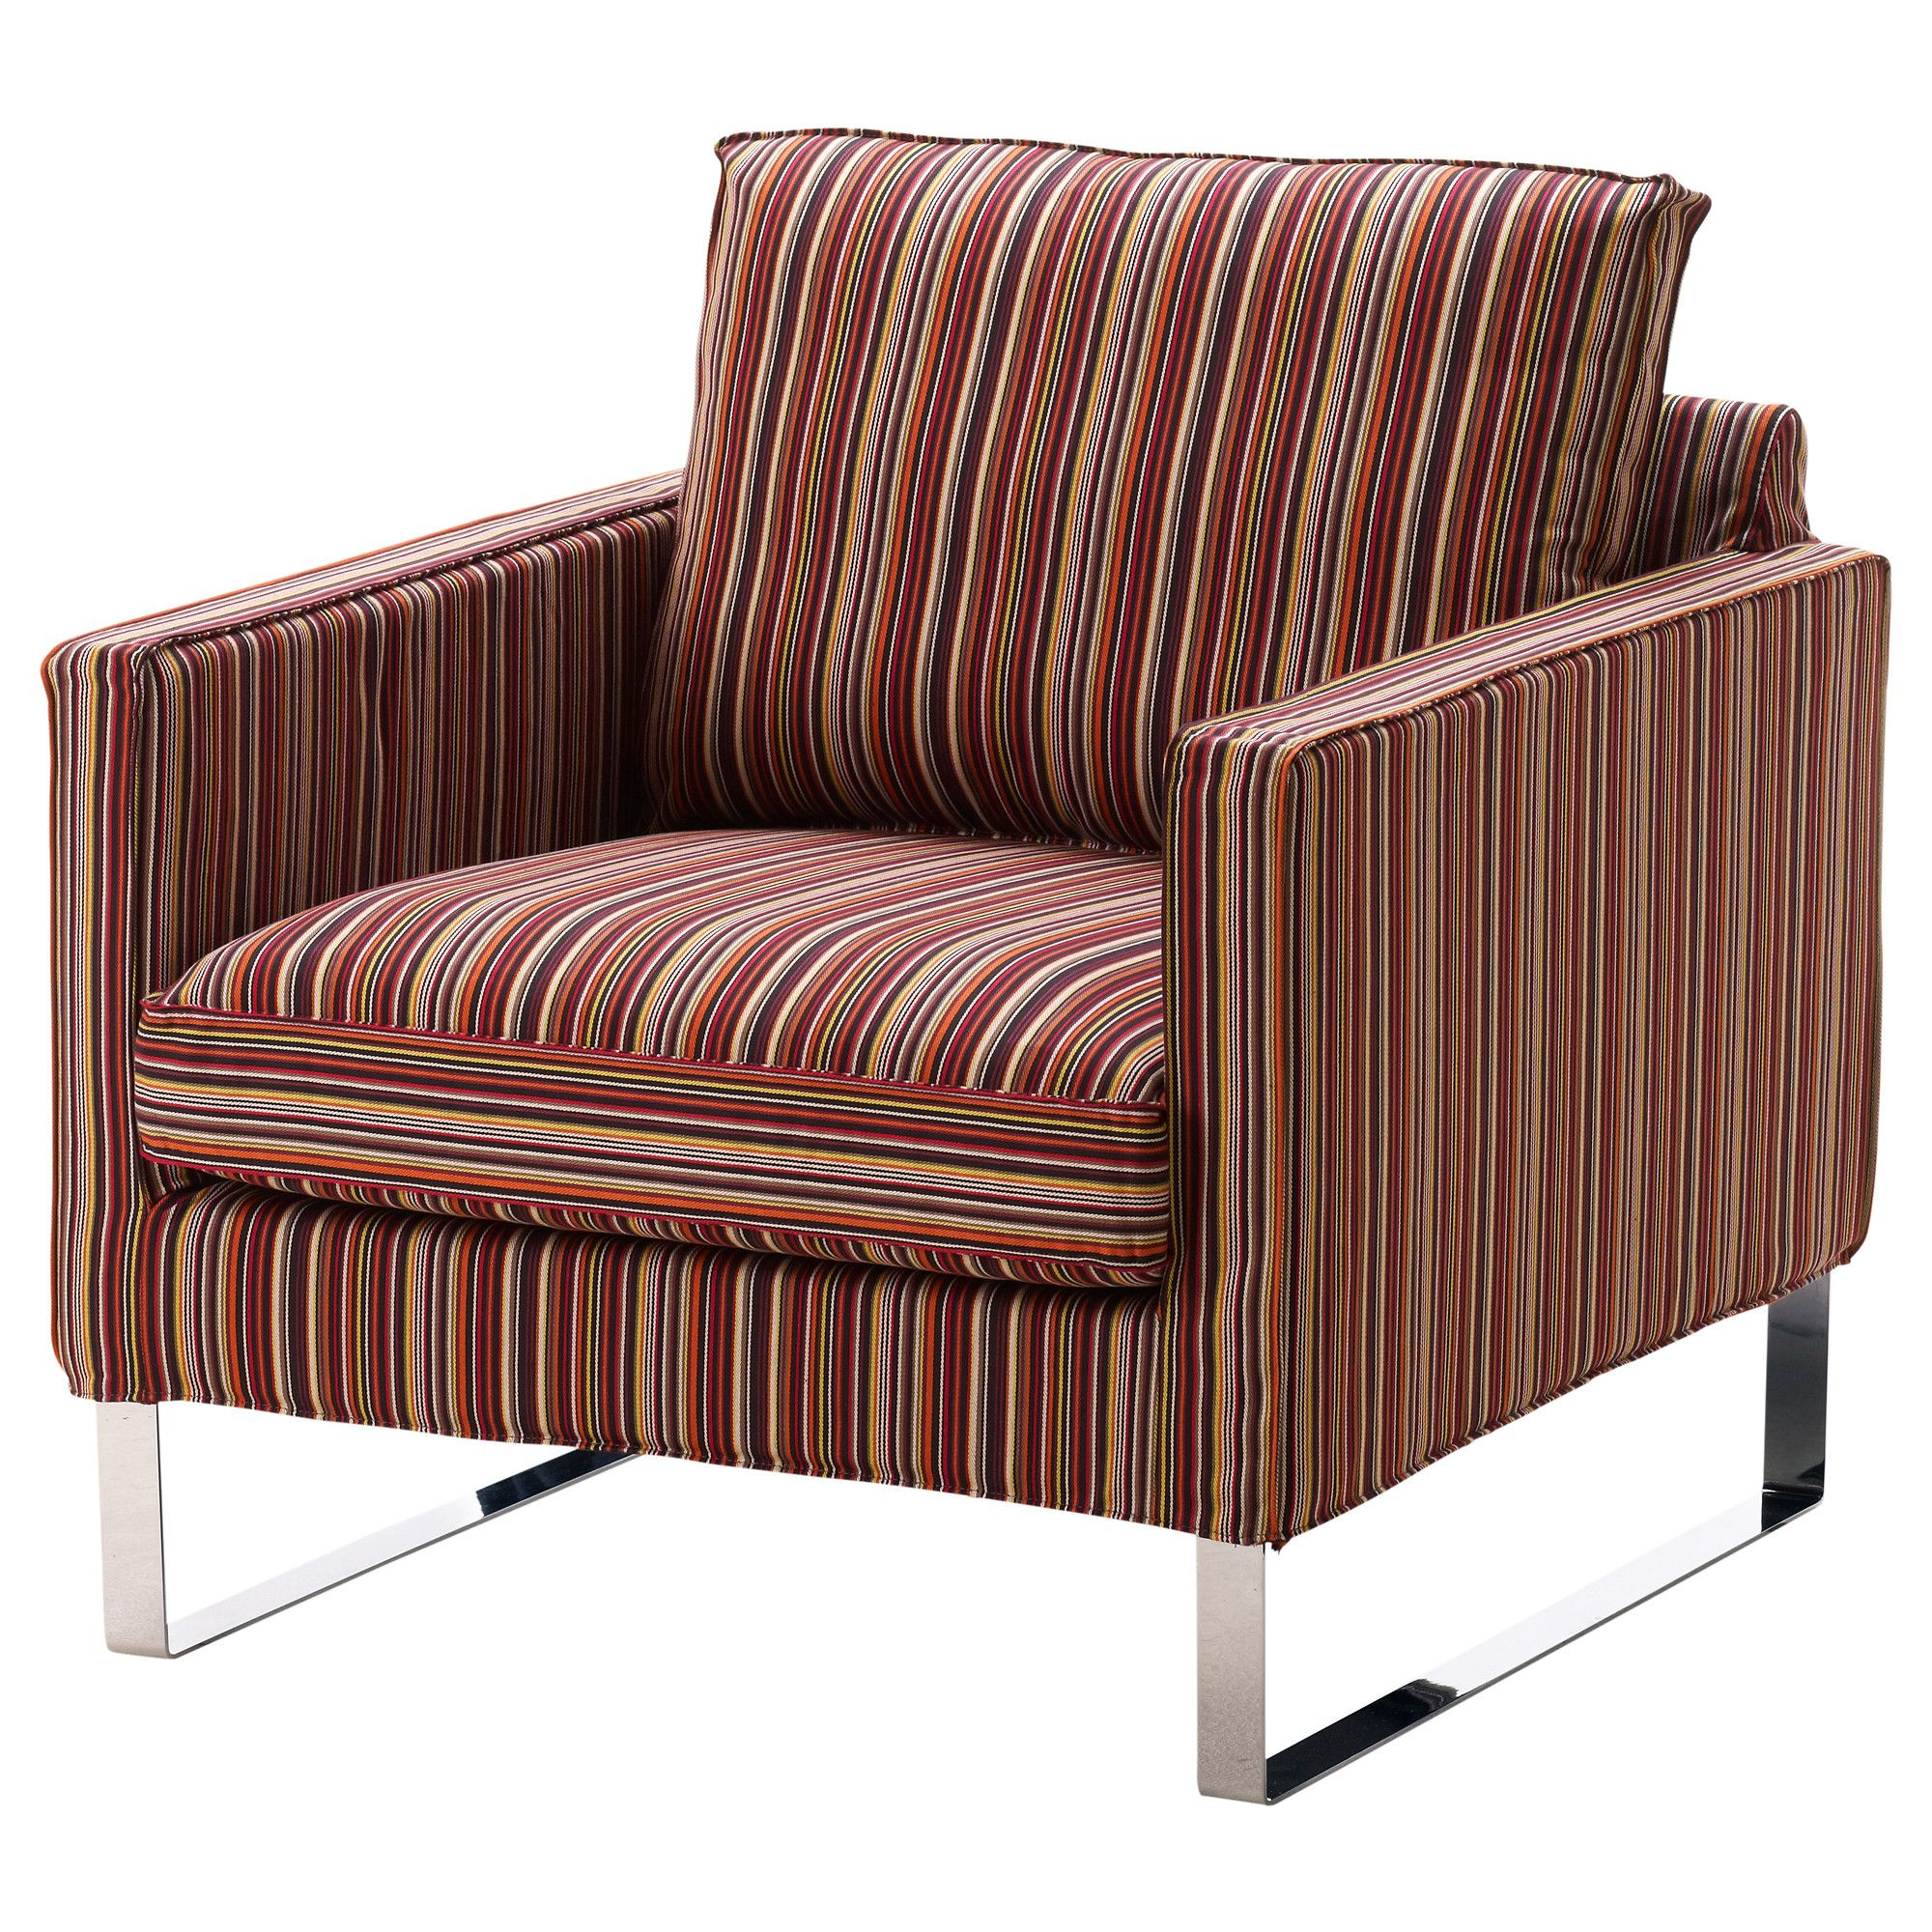 Australia Armchair slipcover, Armchair, Family living rooms